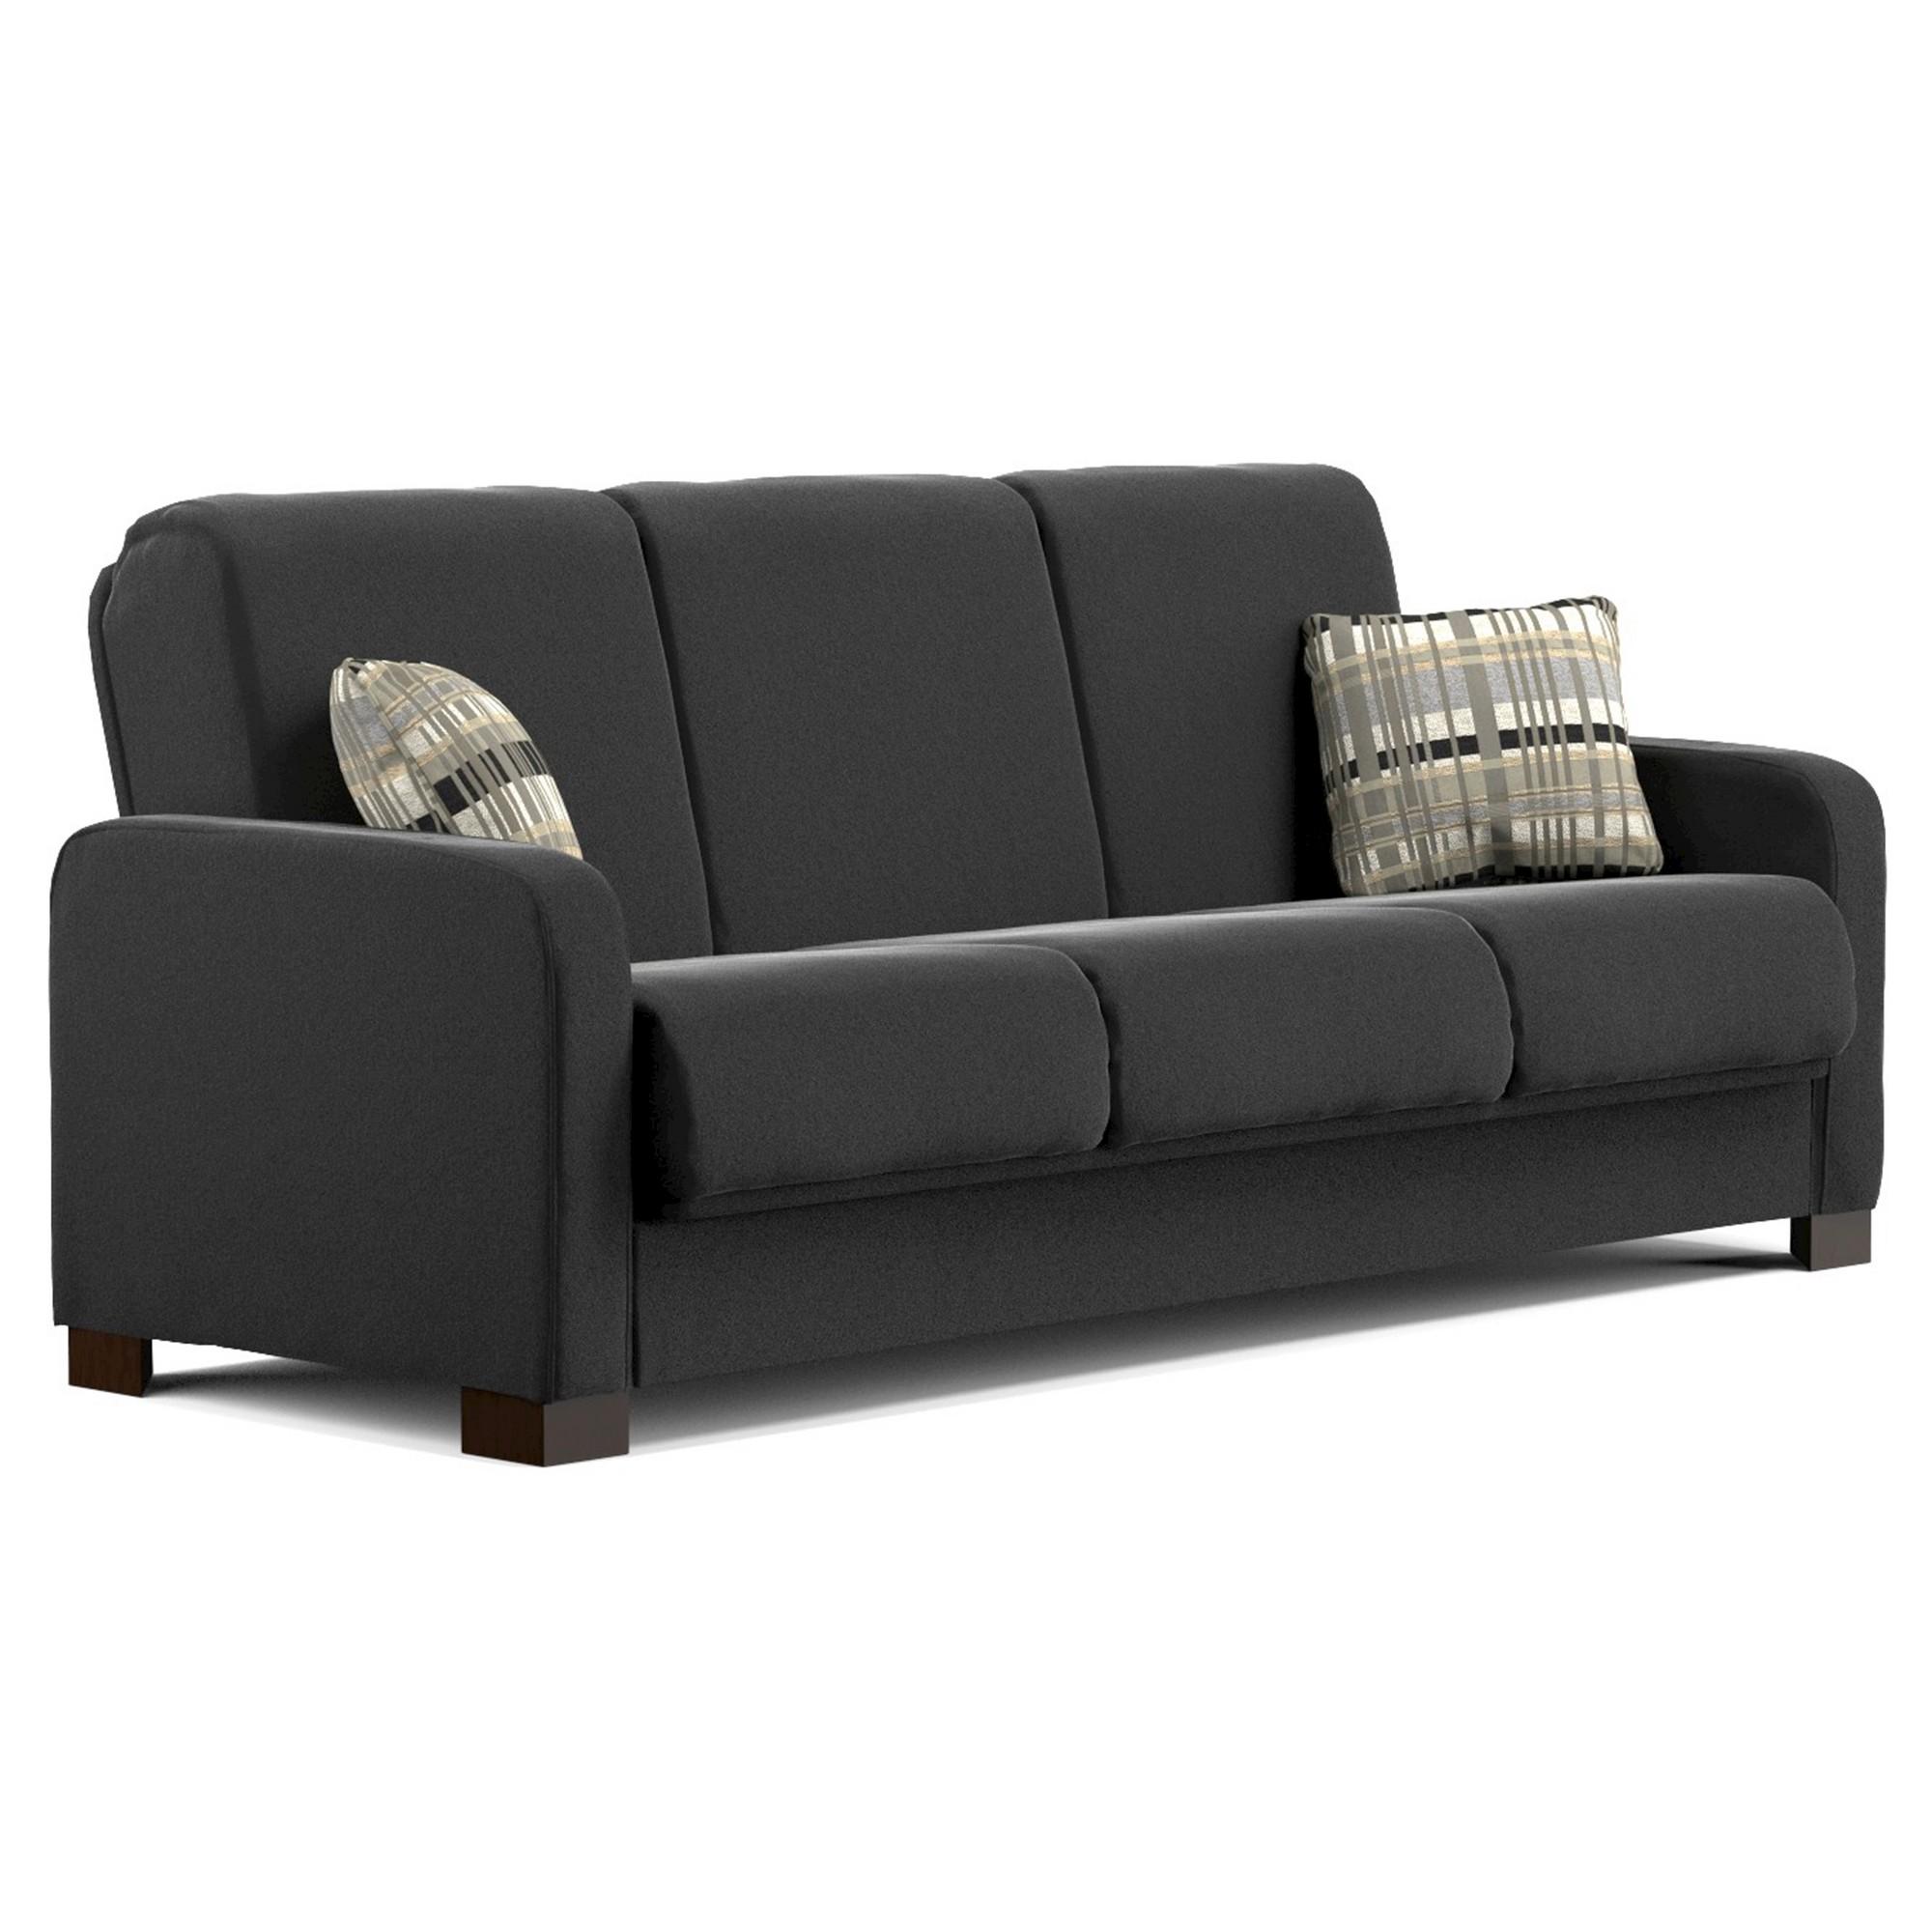 Thora Convert A Couch Black Handy Living Futon Sofa Handy